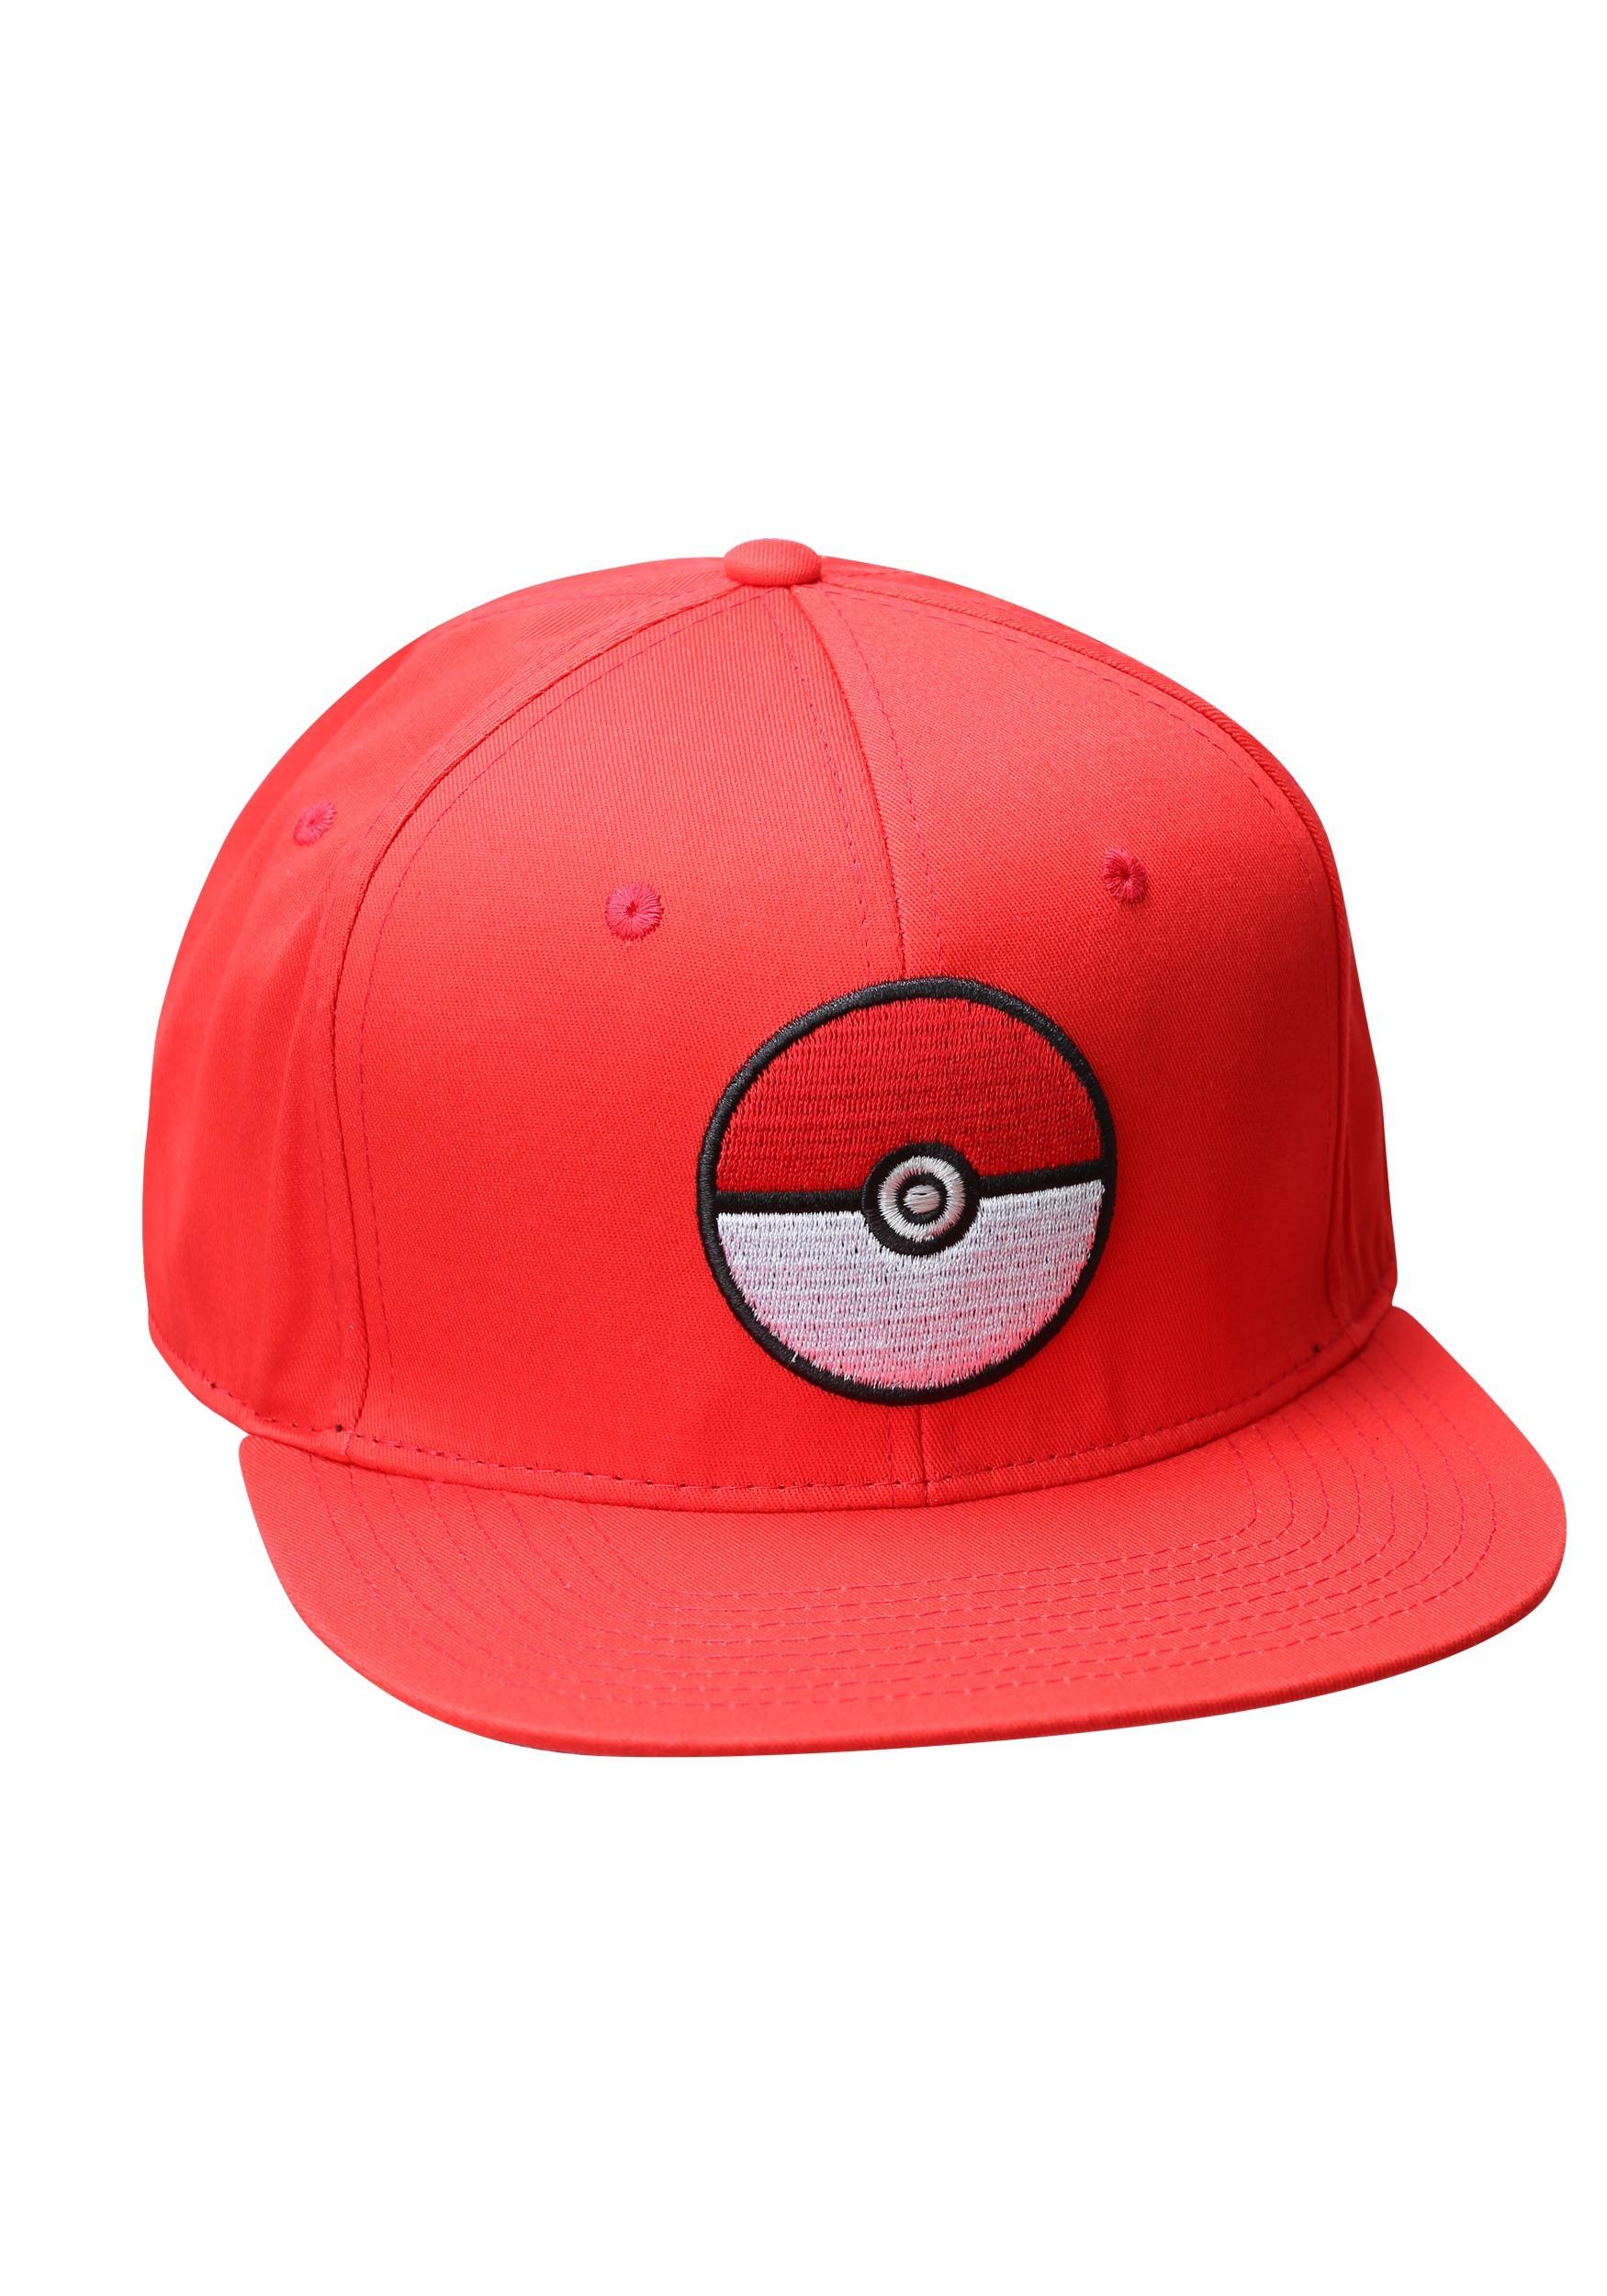 pokemon-pokeball-trainer-red-snapback-hat.jpg aff2081de727